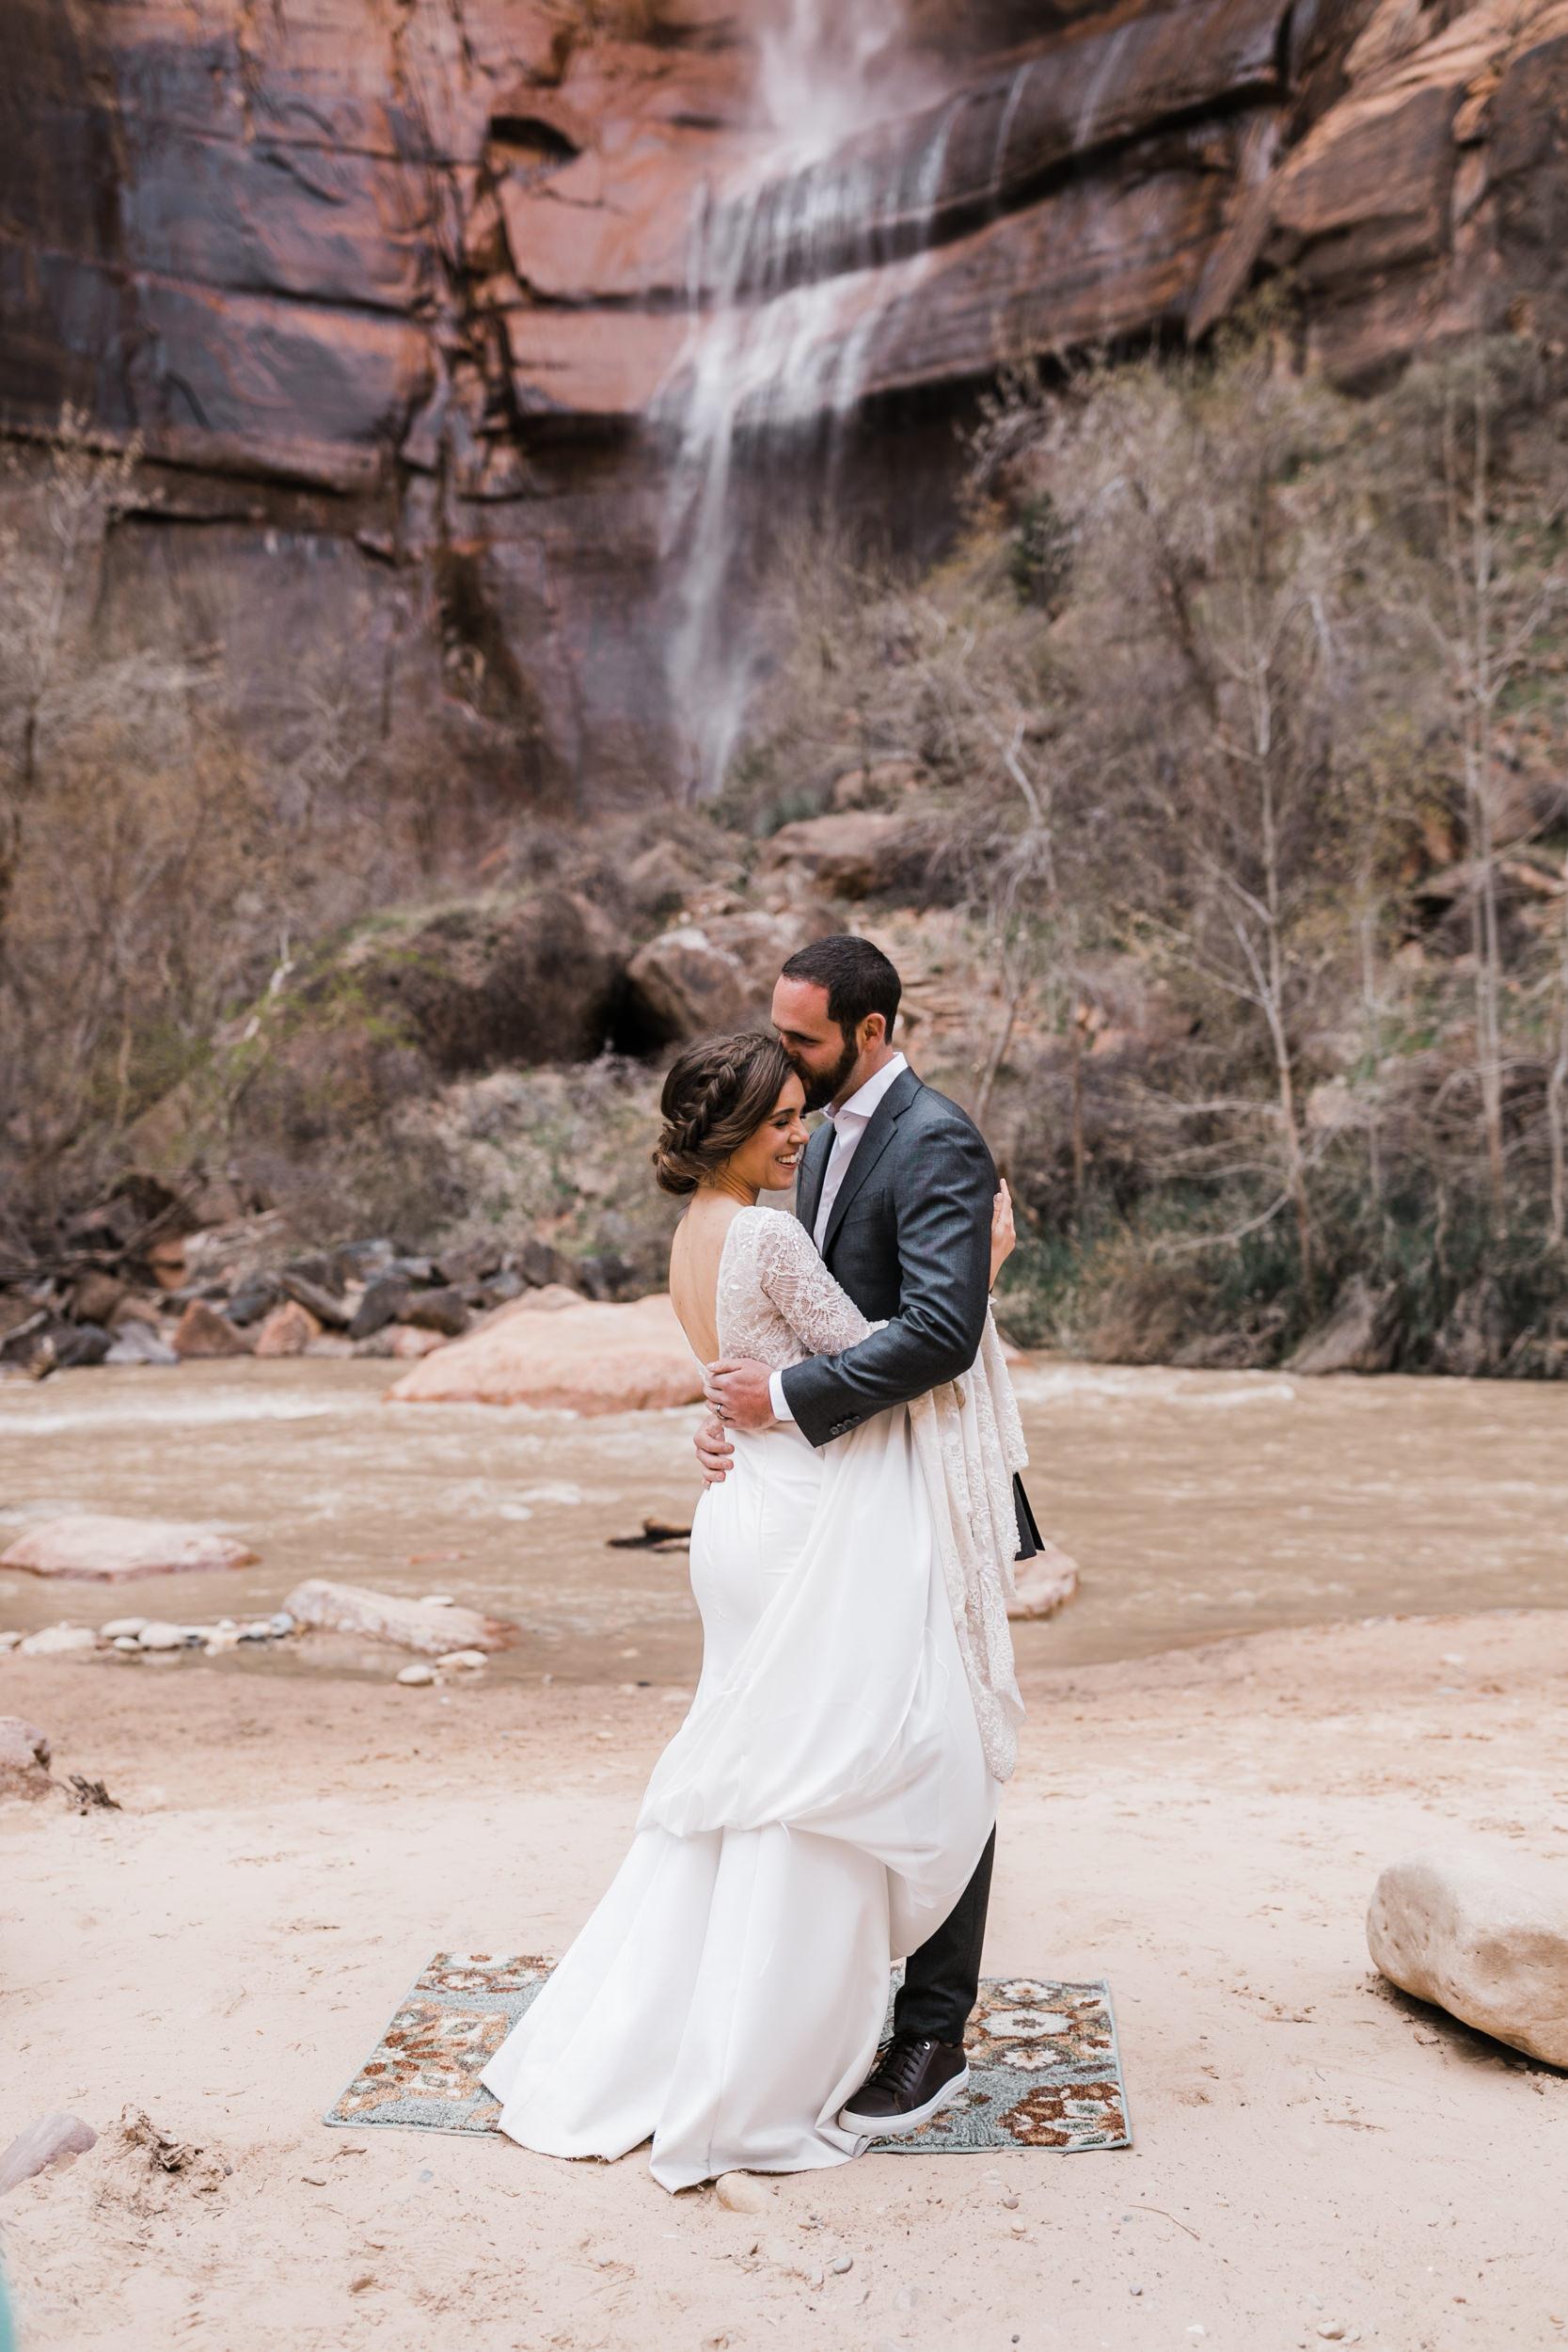 Zion-National-Park-Adventure-Wedding-Hearnes-Elopement-Photography-23.jpg